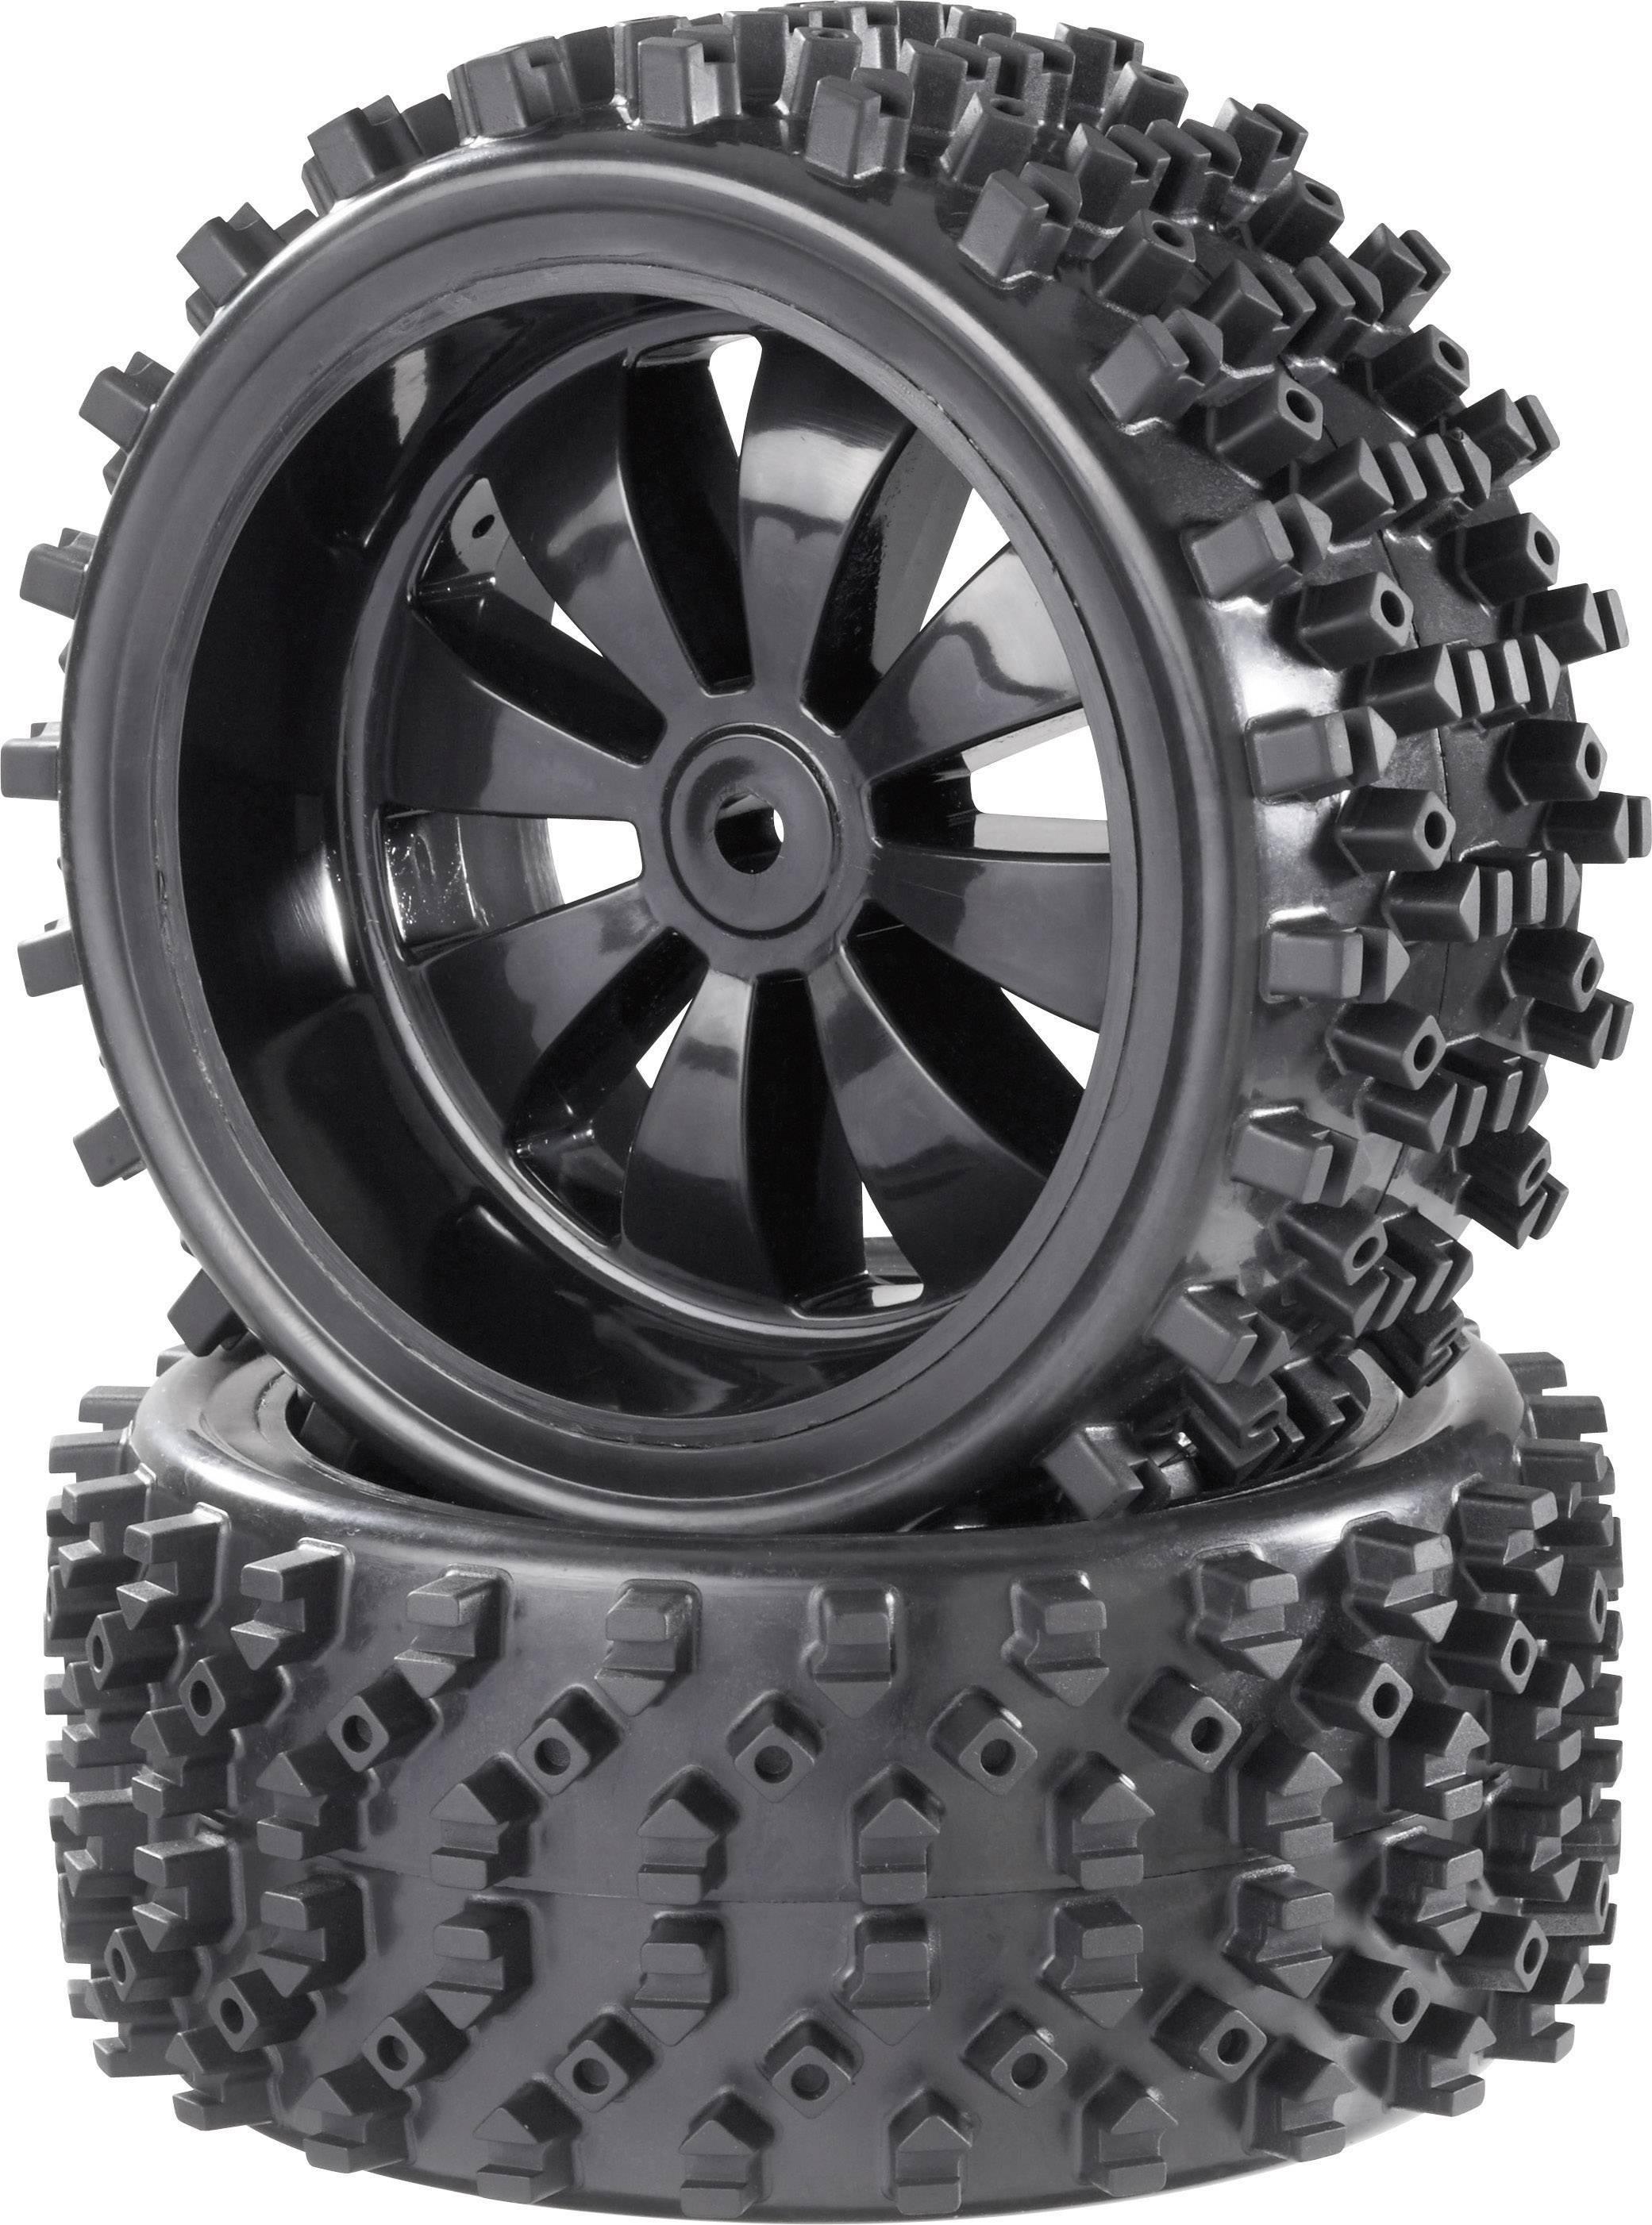 Kompletné kolesá Block-Spike Reely 112025 pre buggy, 154 mm, 1:6, 2 ks, čierna (lesklá)